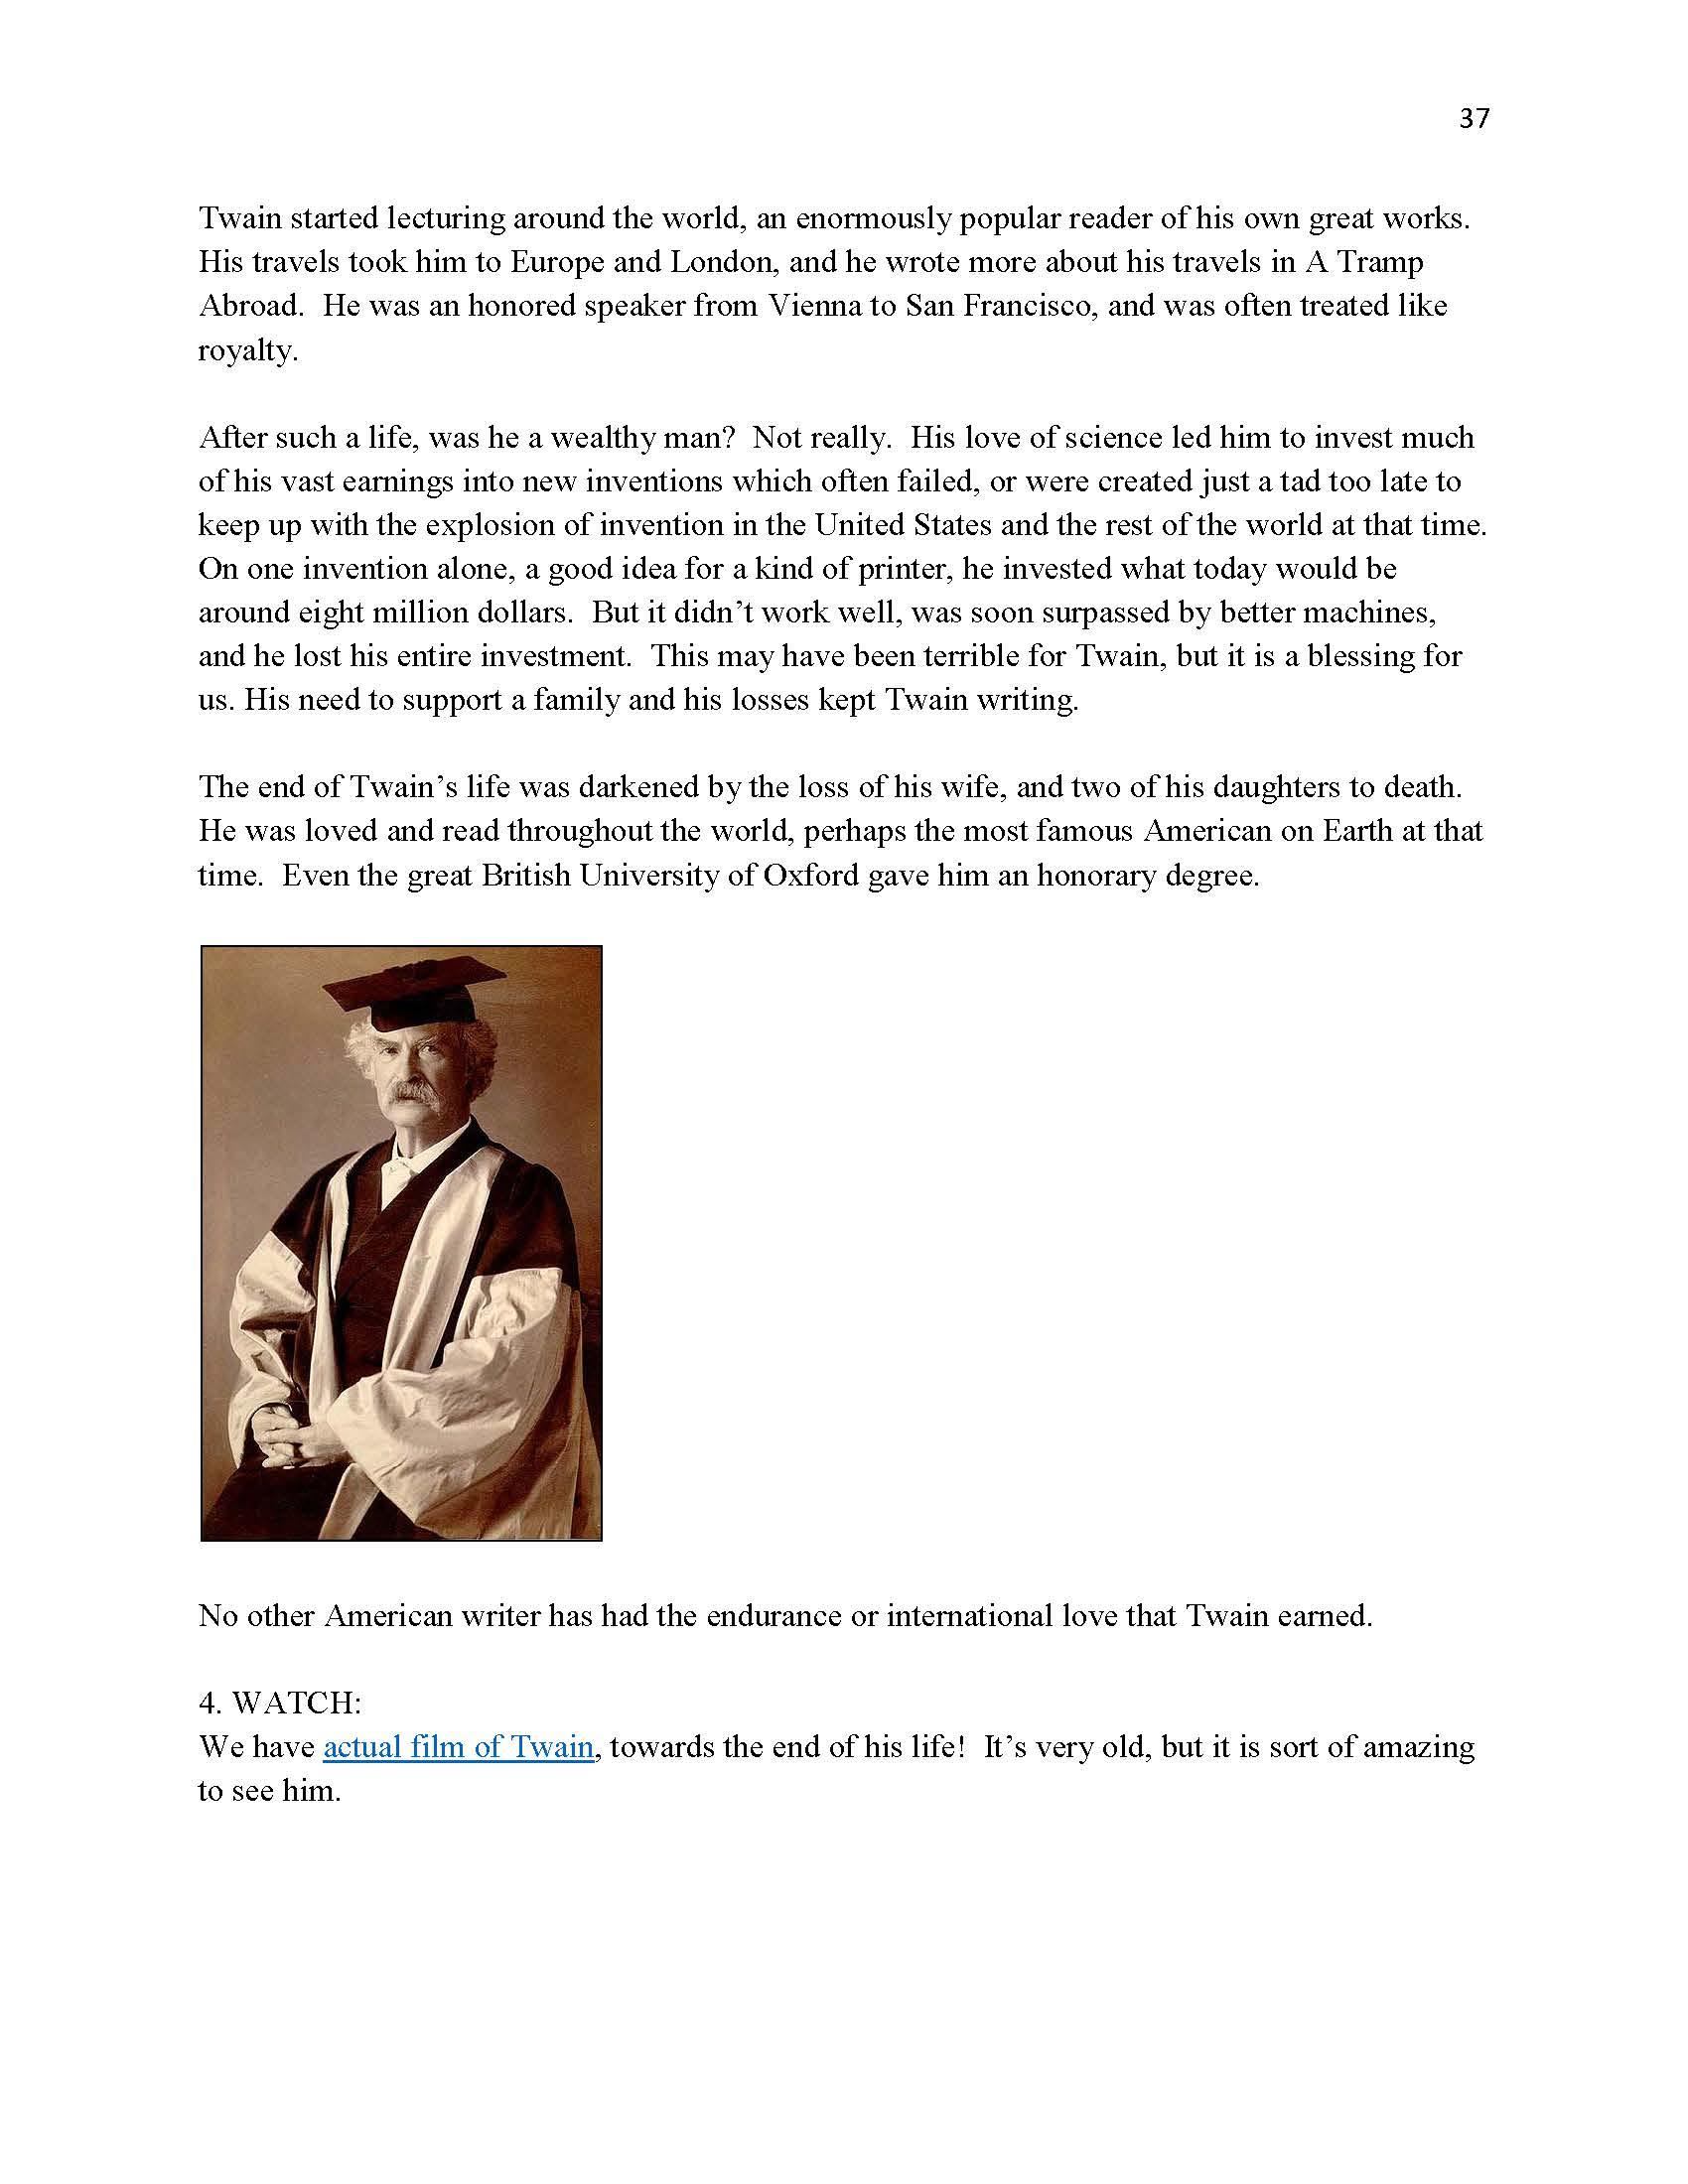 Step 3-4 Literature Guide - Mark Twain Short Stories_Page_038.jpg